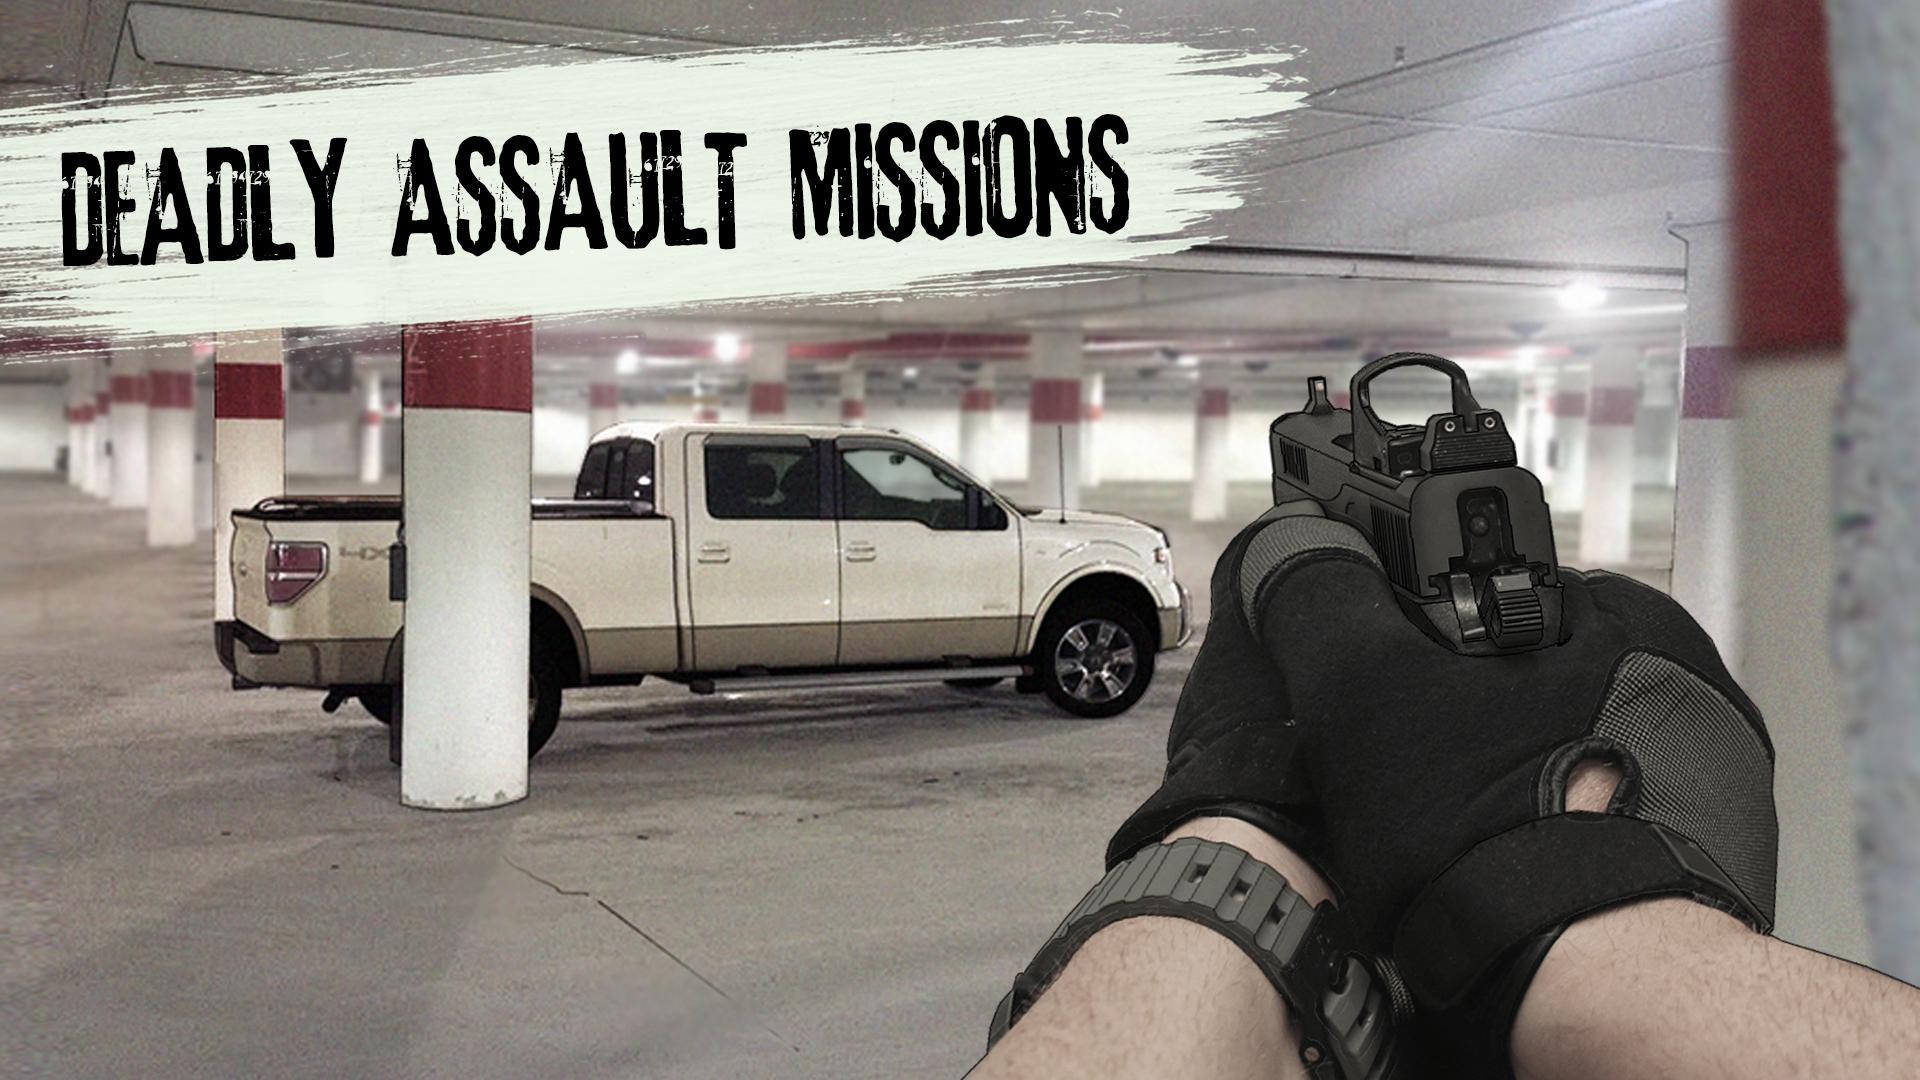 LONEWOLF (17+) - a Sniper Story 1.2.95 Screenshot 11